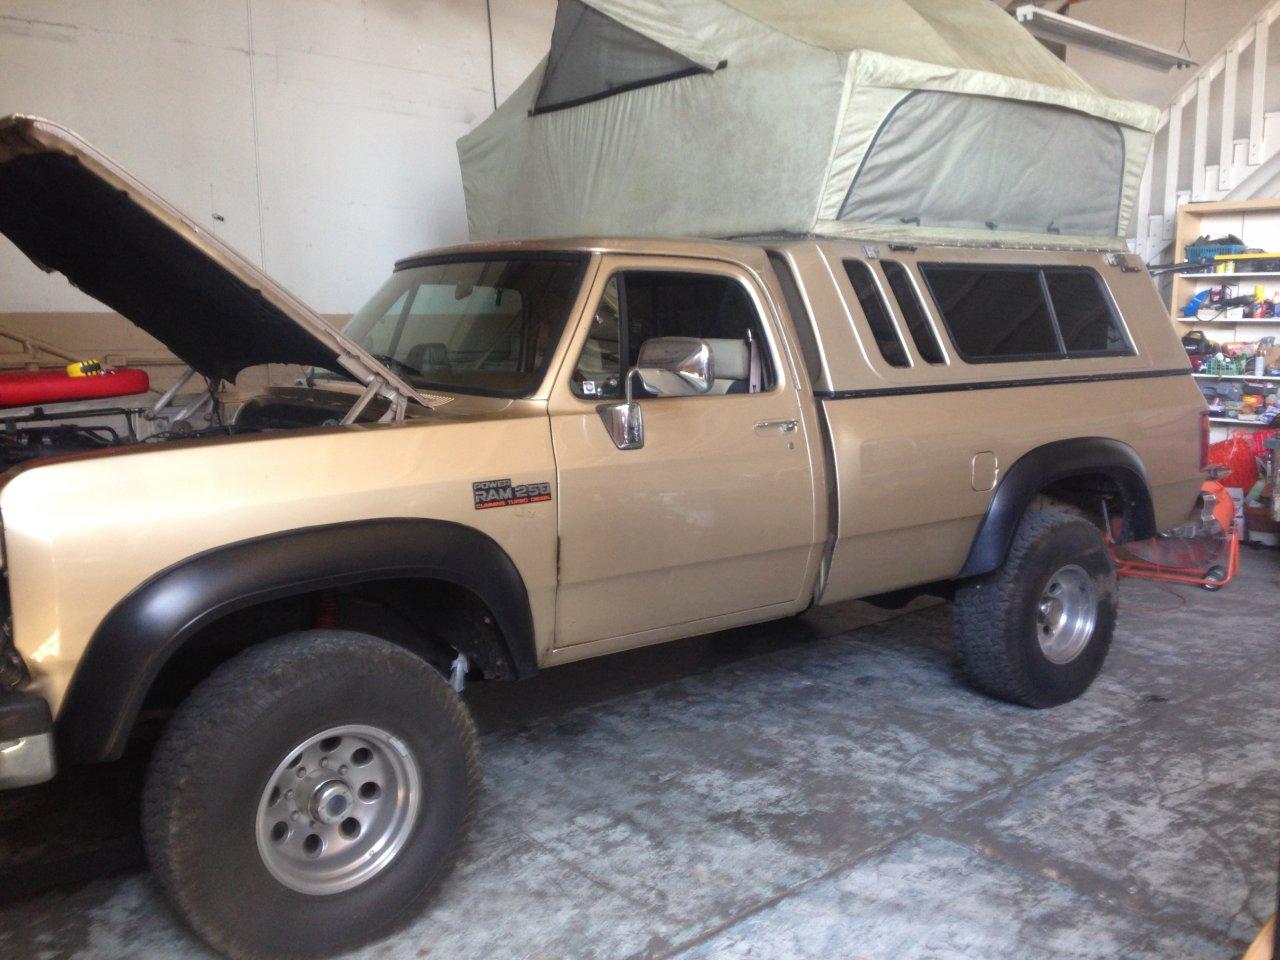 & For Sale - Wildernest camper top for truck | IH8MUD Forum